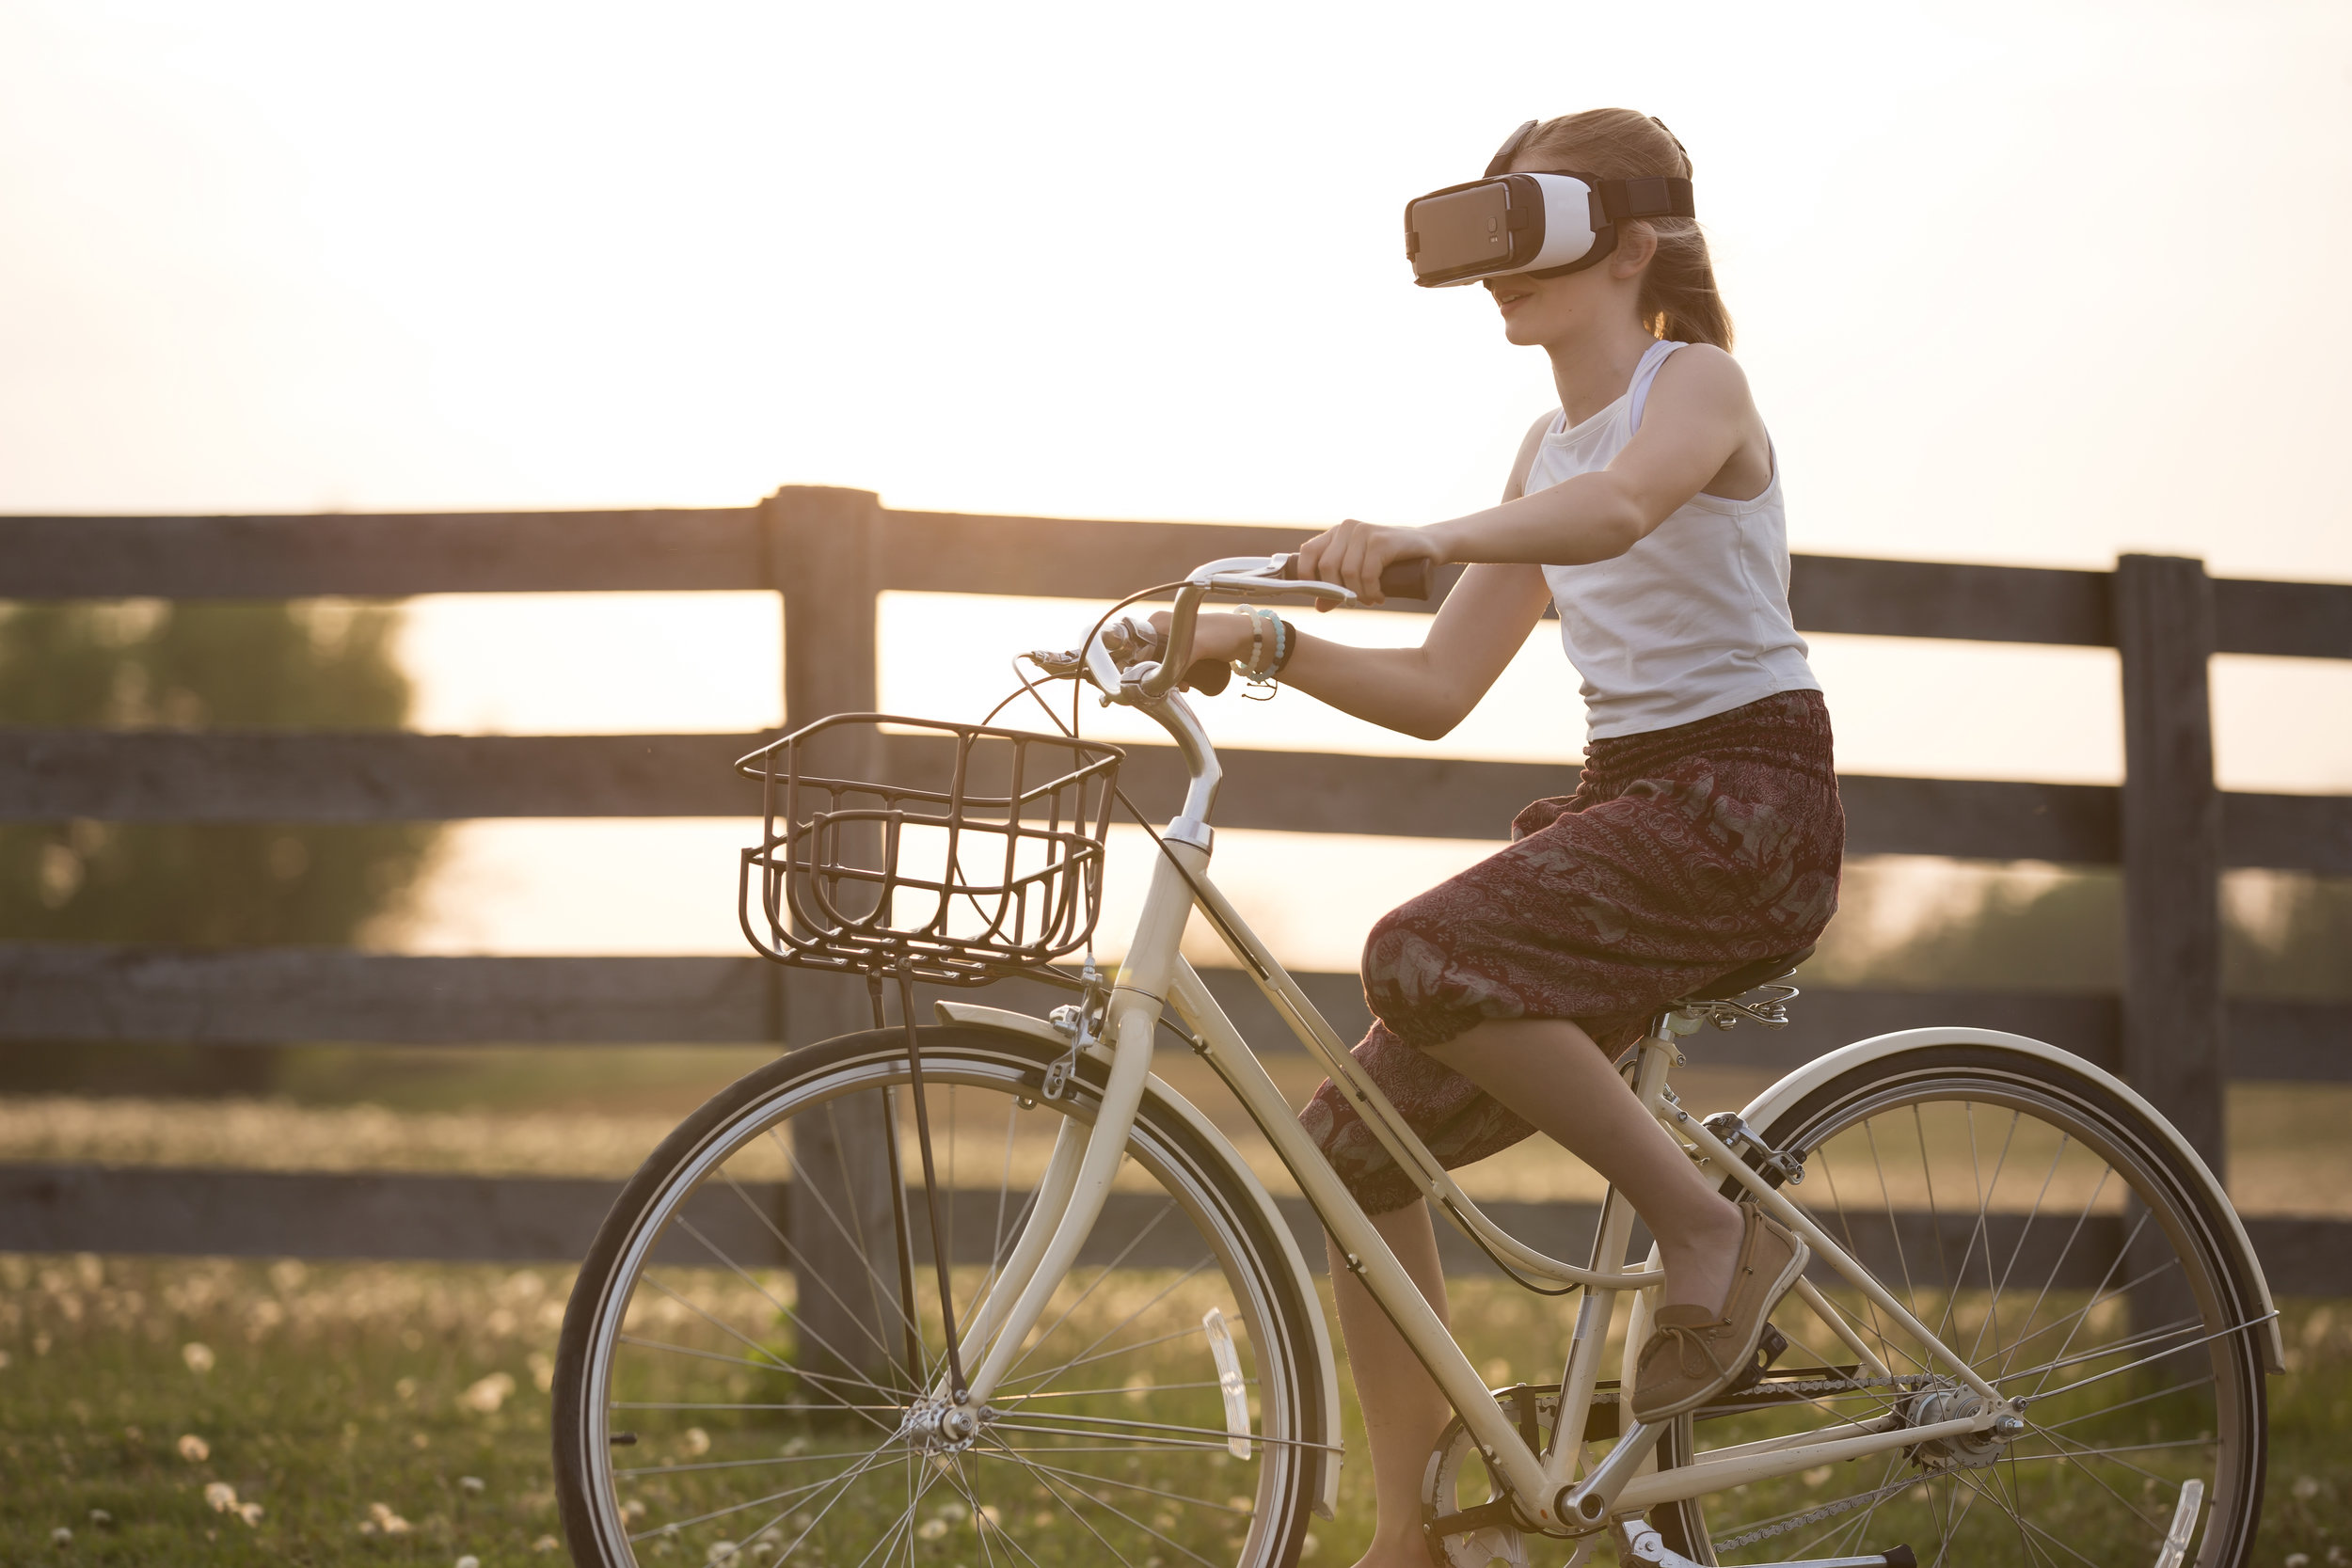 Photo DE Sebastian Voortman from Pexels https://www.pexels.com/photo/girl-wearing-vr-box-driving-bicycle-during-golden-hour-166055/